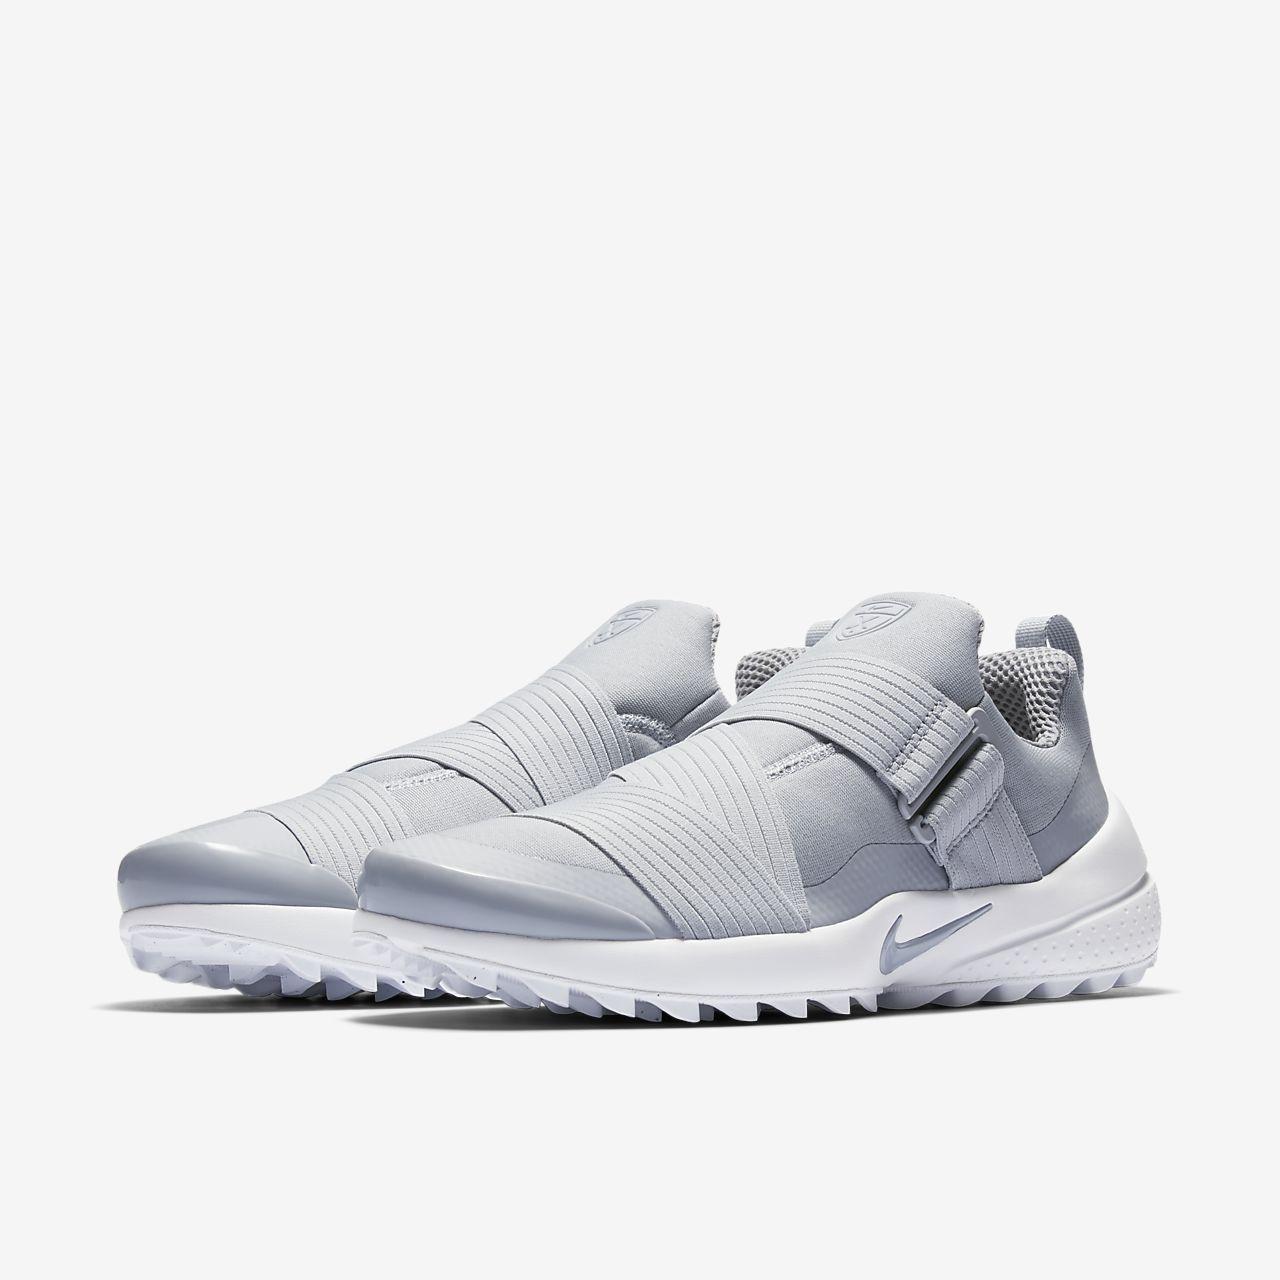 ... Nike Air Zoom Gimme Men's Golf Shoe